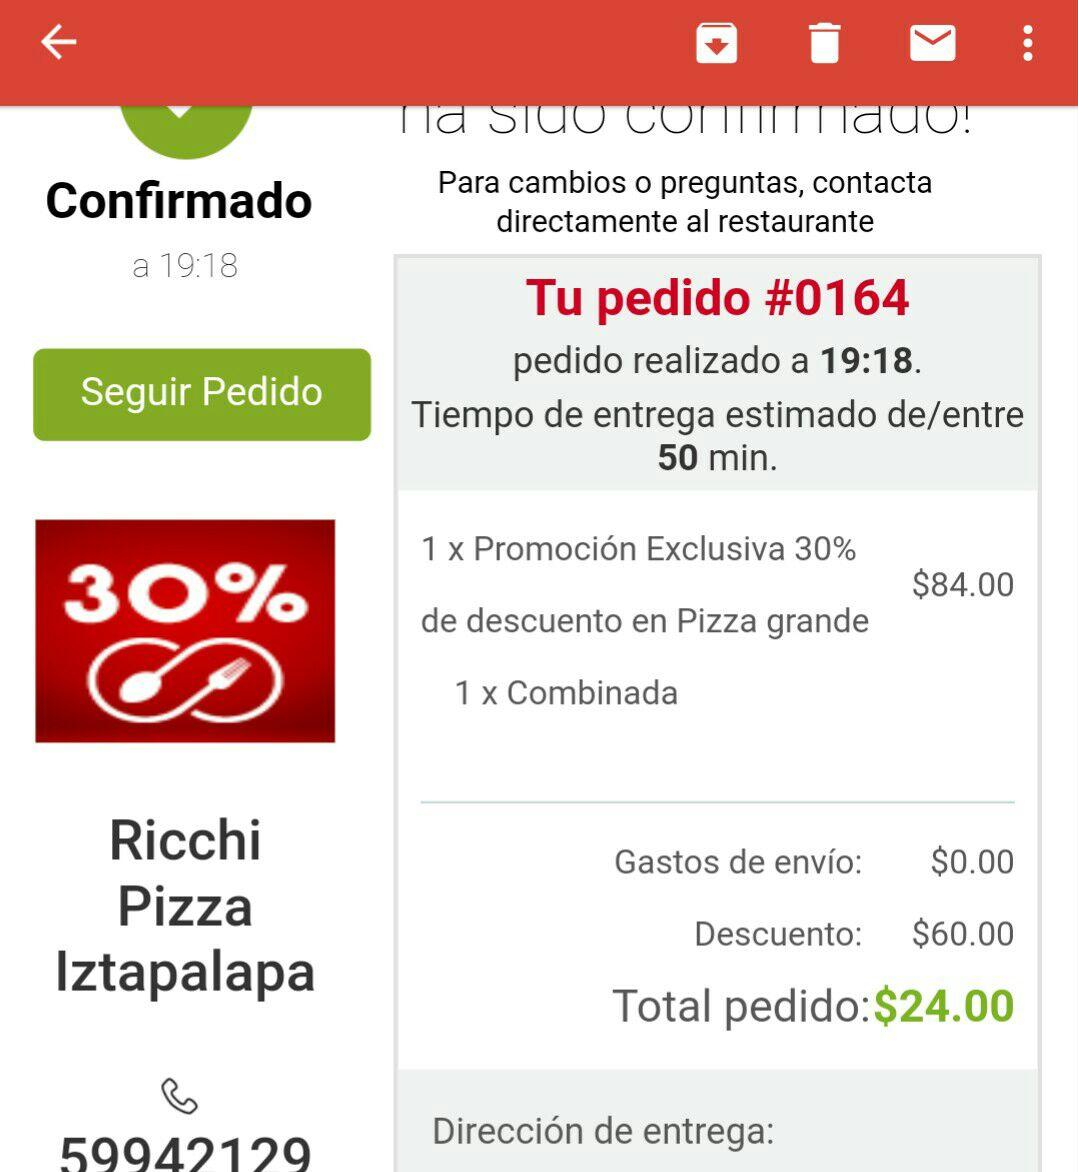 SinDelantal Ricchi Pizza Iztapalapa CDMX: Pizza grande a $24 con cupón